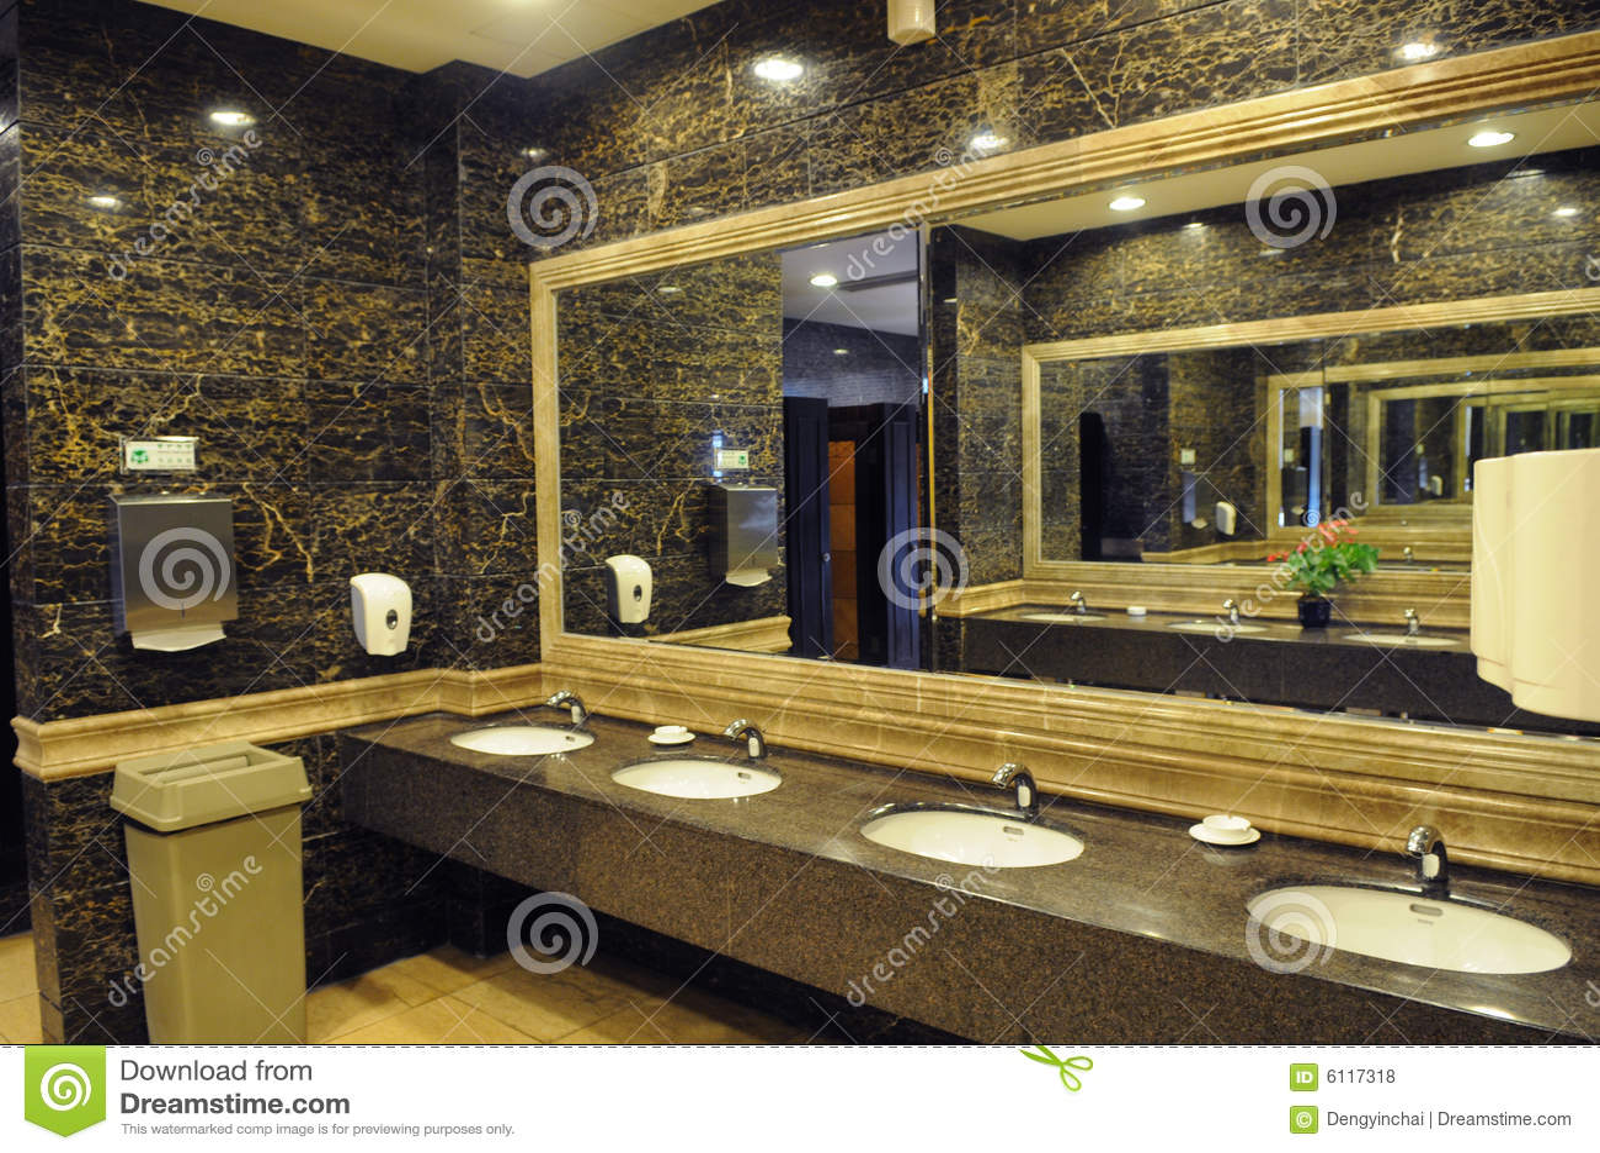 404 not found - Interieur hotel de luxe ...